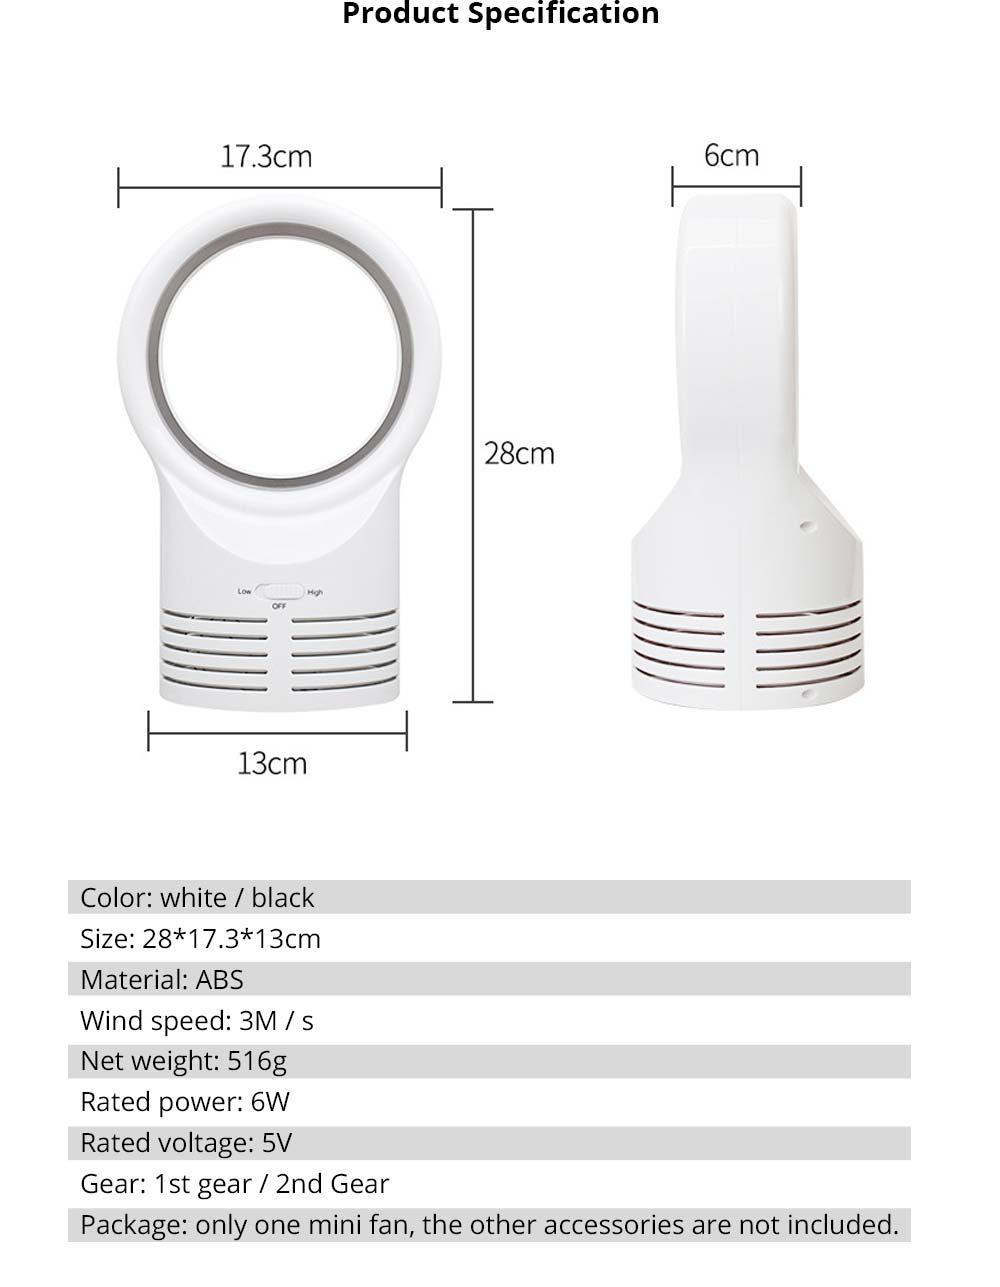 Mini Bladeless Fan - Travel Handy Air Cooler, USB Rechargeable Portable Desktop Air Multiplier 7